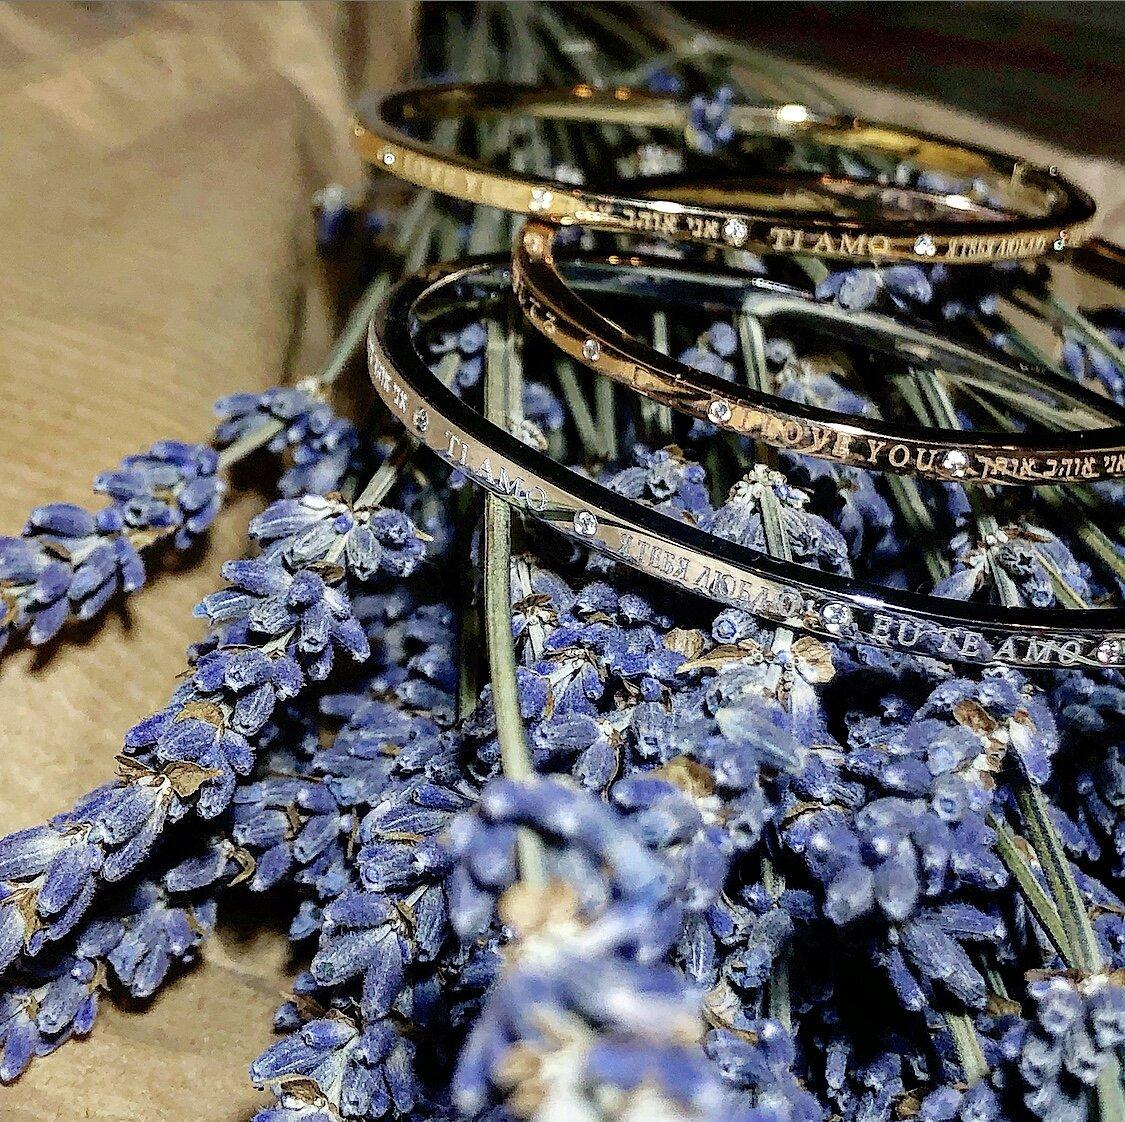 Matthia's & Claire 18K Gold & Diamond Dream Collection 'I Love You' Bracelet, $2,595